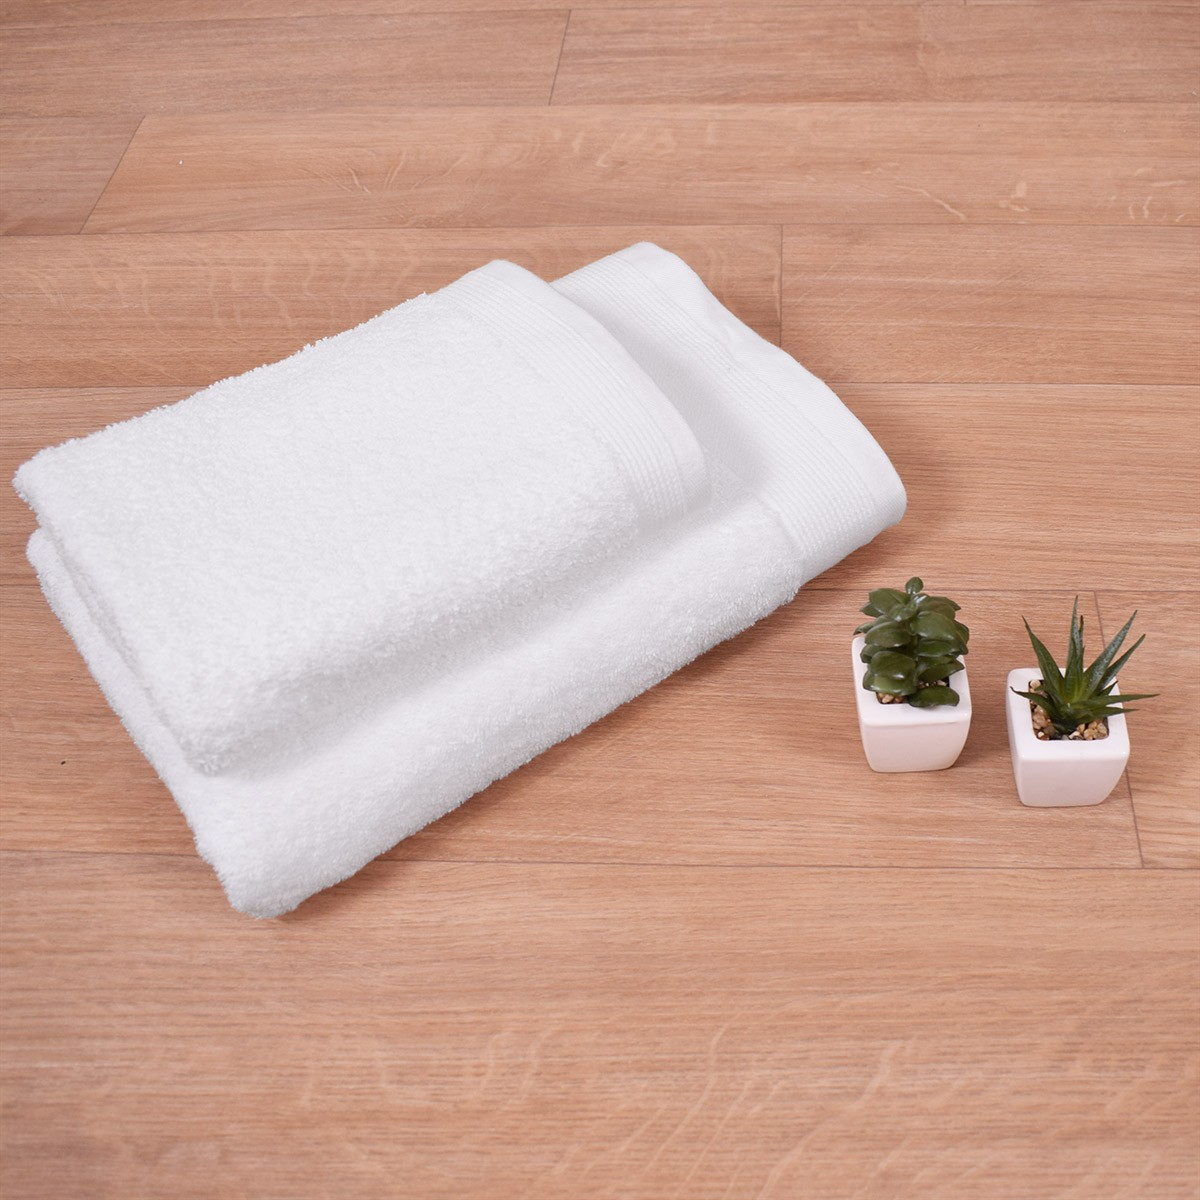 Spitishop * Πετσέτα Σώματος Λευκή (90×150) Cleopatra 700gr/m2